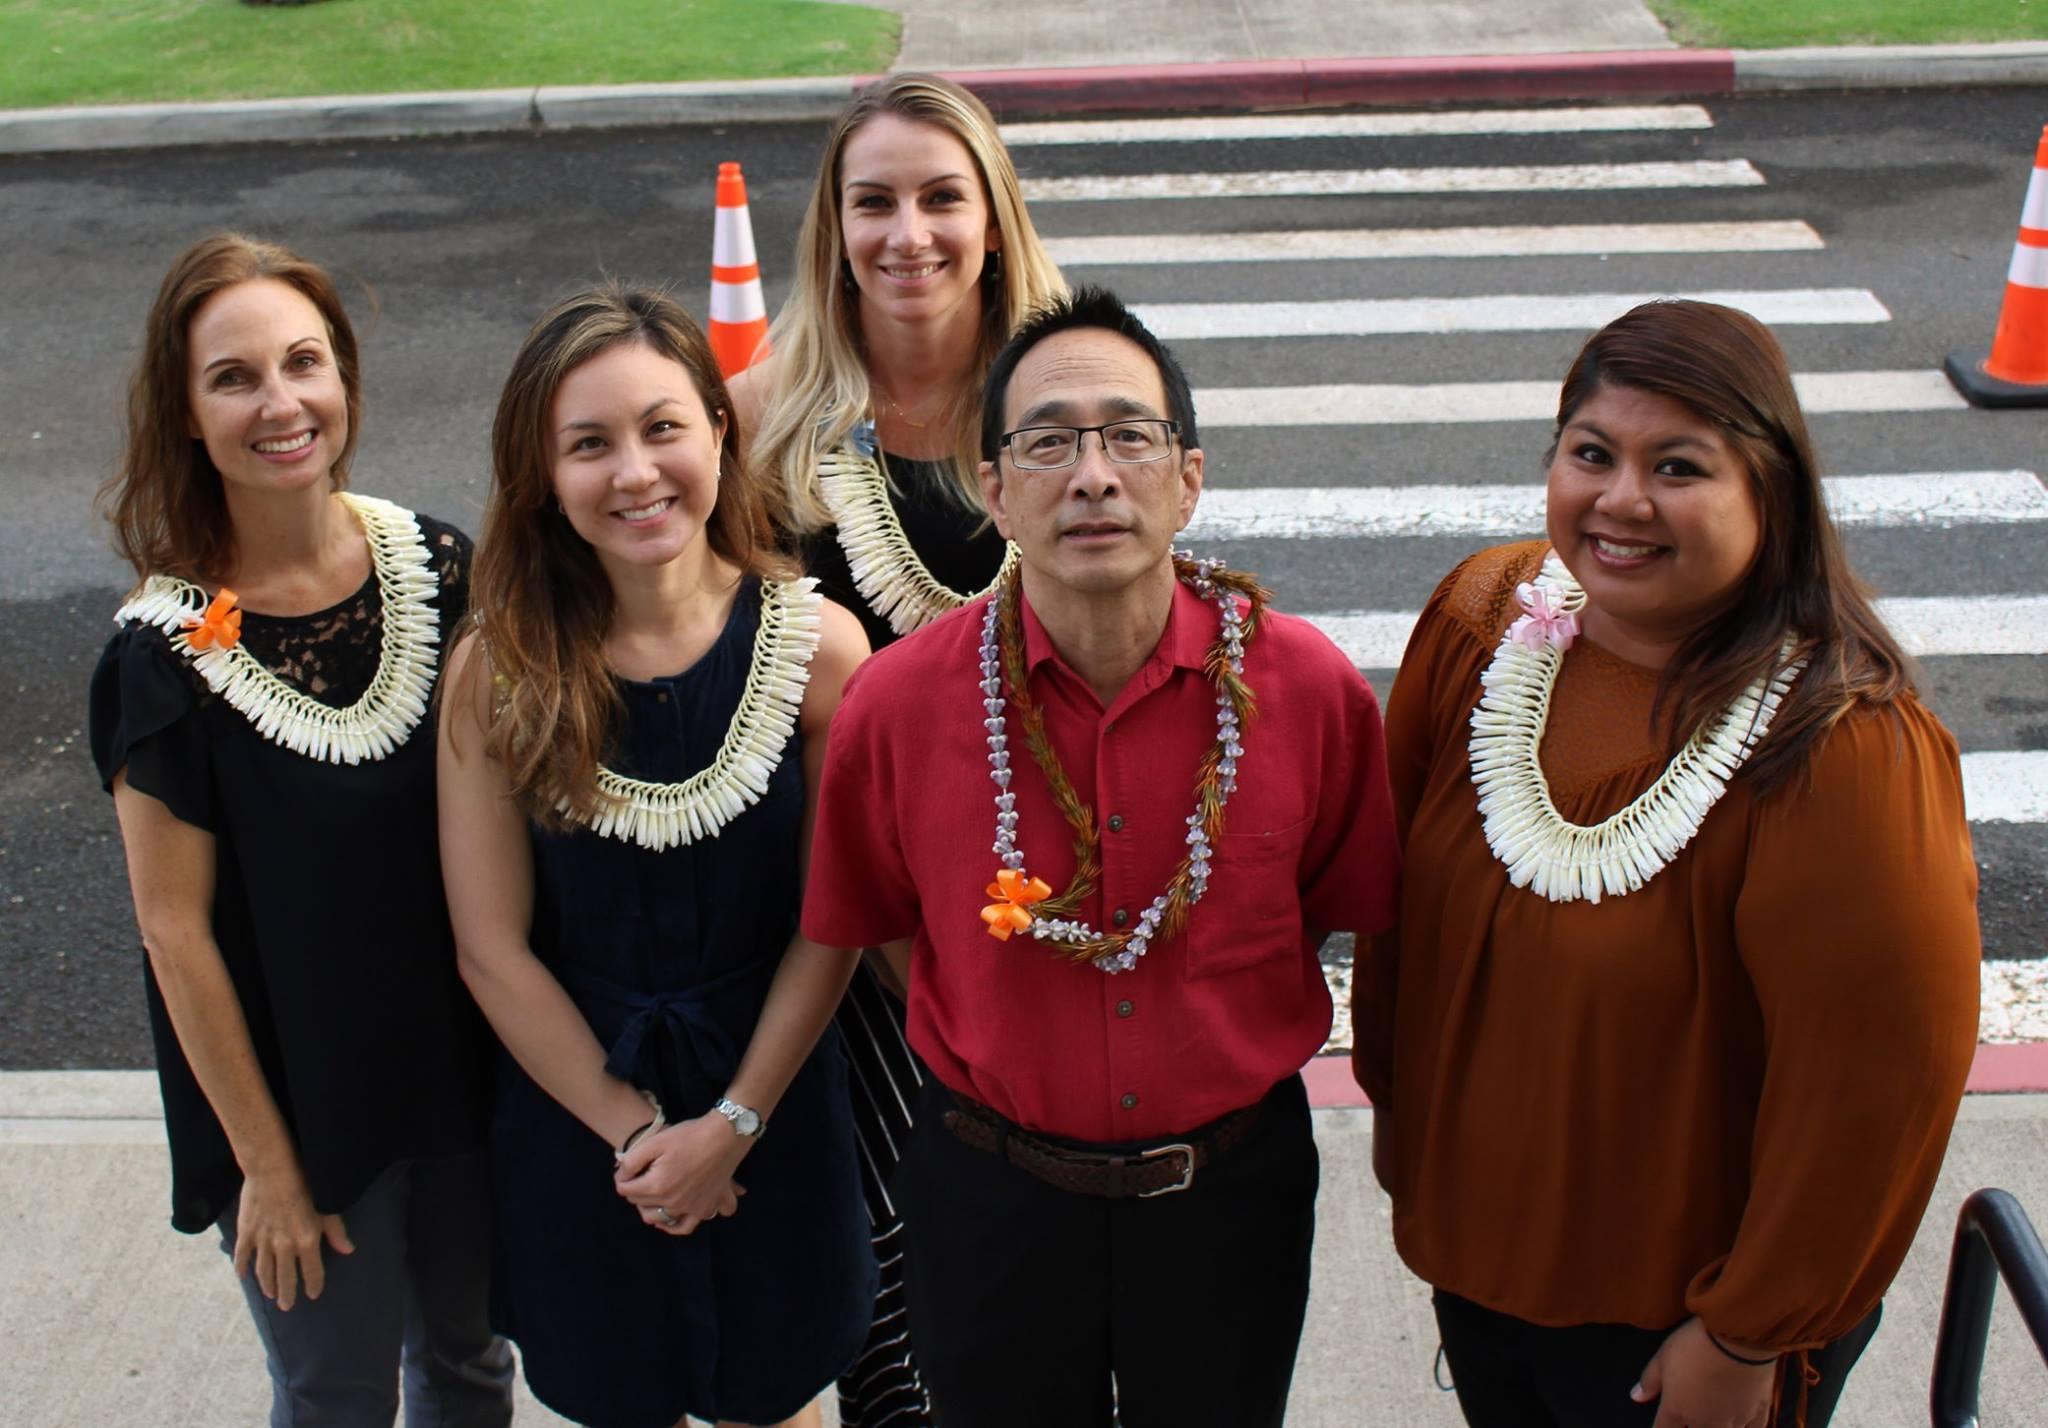 Counselors at Sacred Hearts Academy celebrate National School Counseling Week. (Left to right) Fiona Hayashi, Marcia Chaddock, Angela Dolan, Randy Fong and Anna Miyashiro.